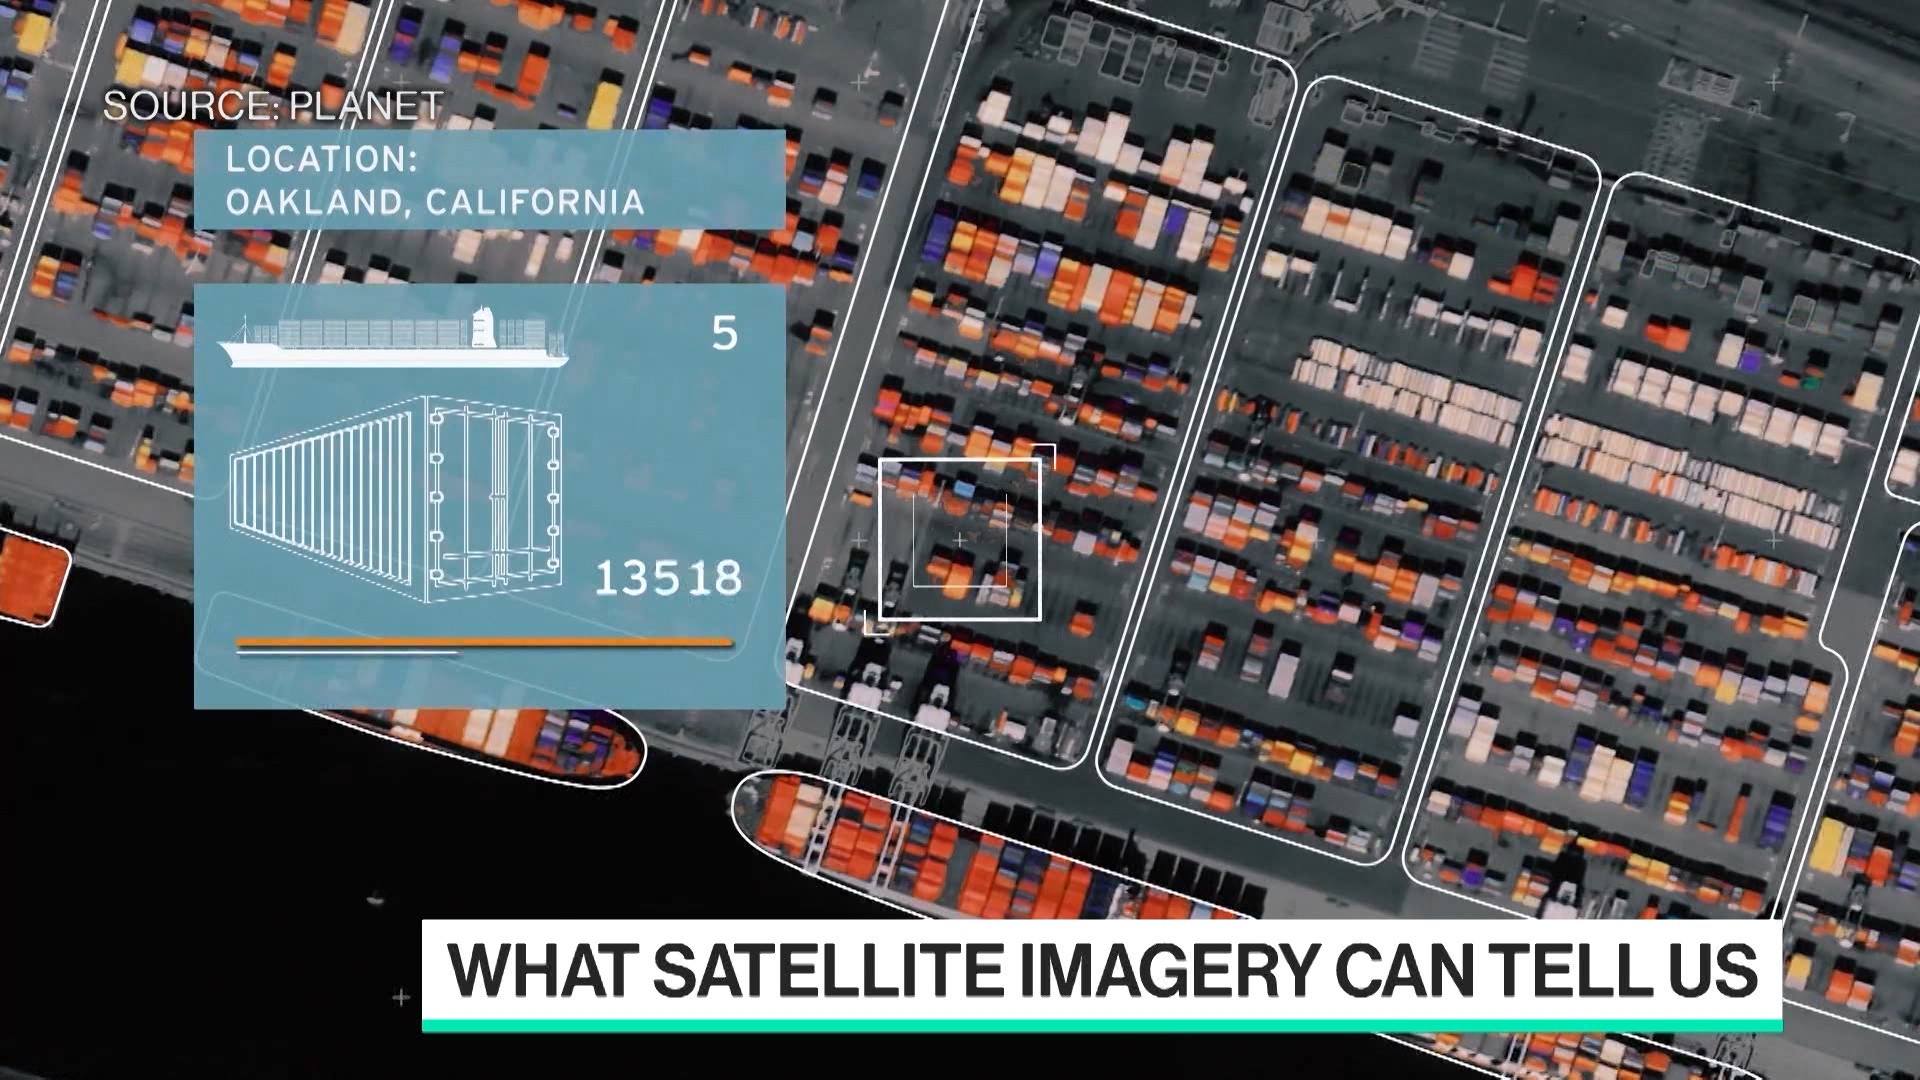 Using Satellites to Predict the Future